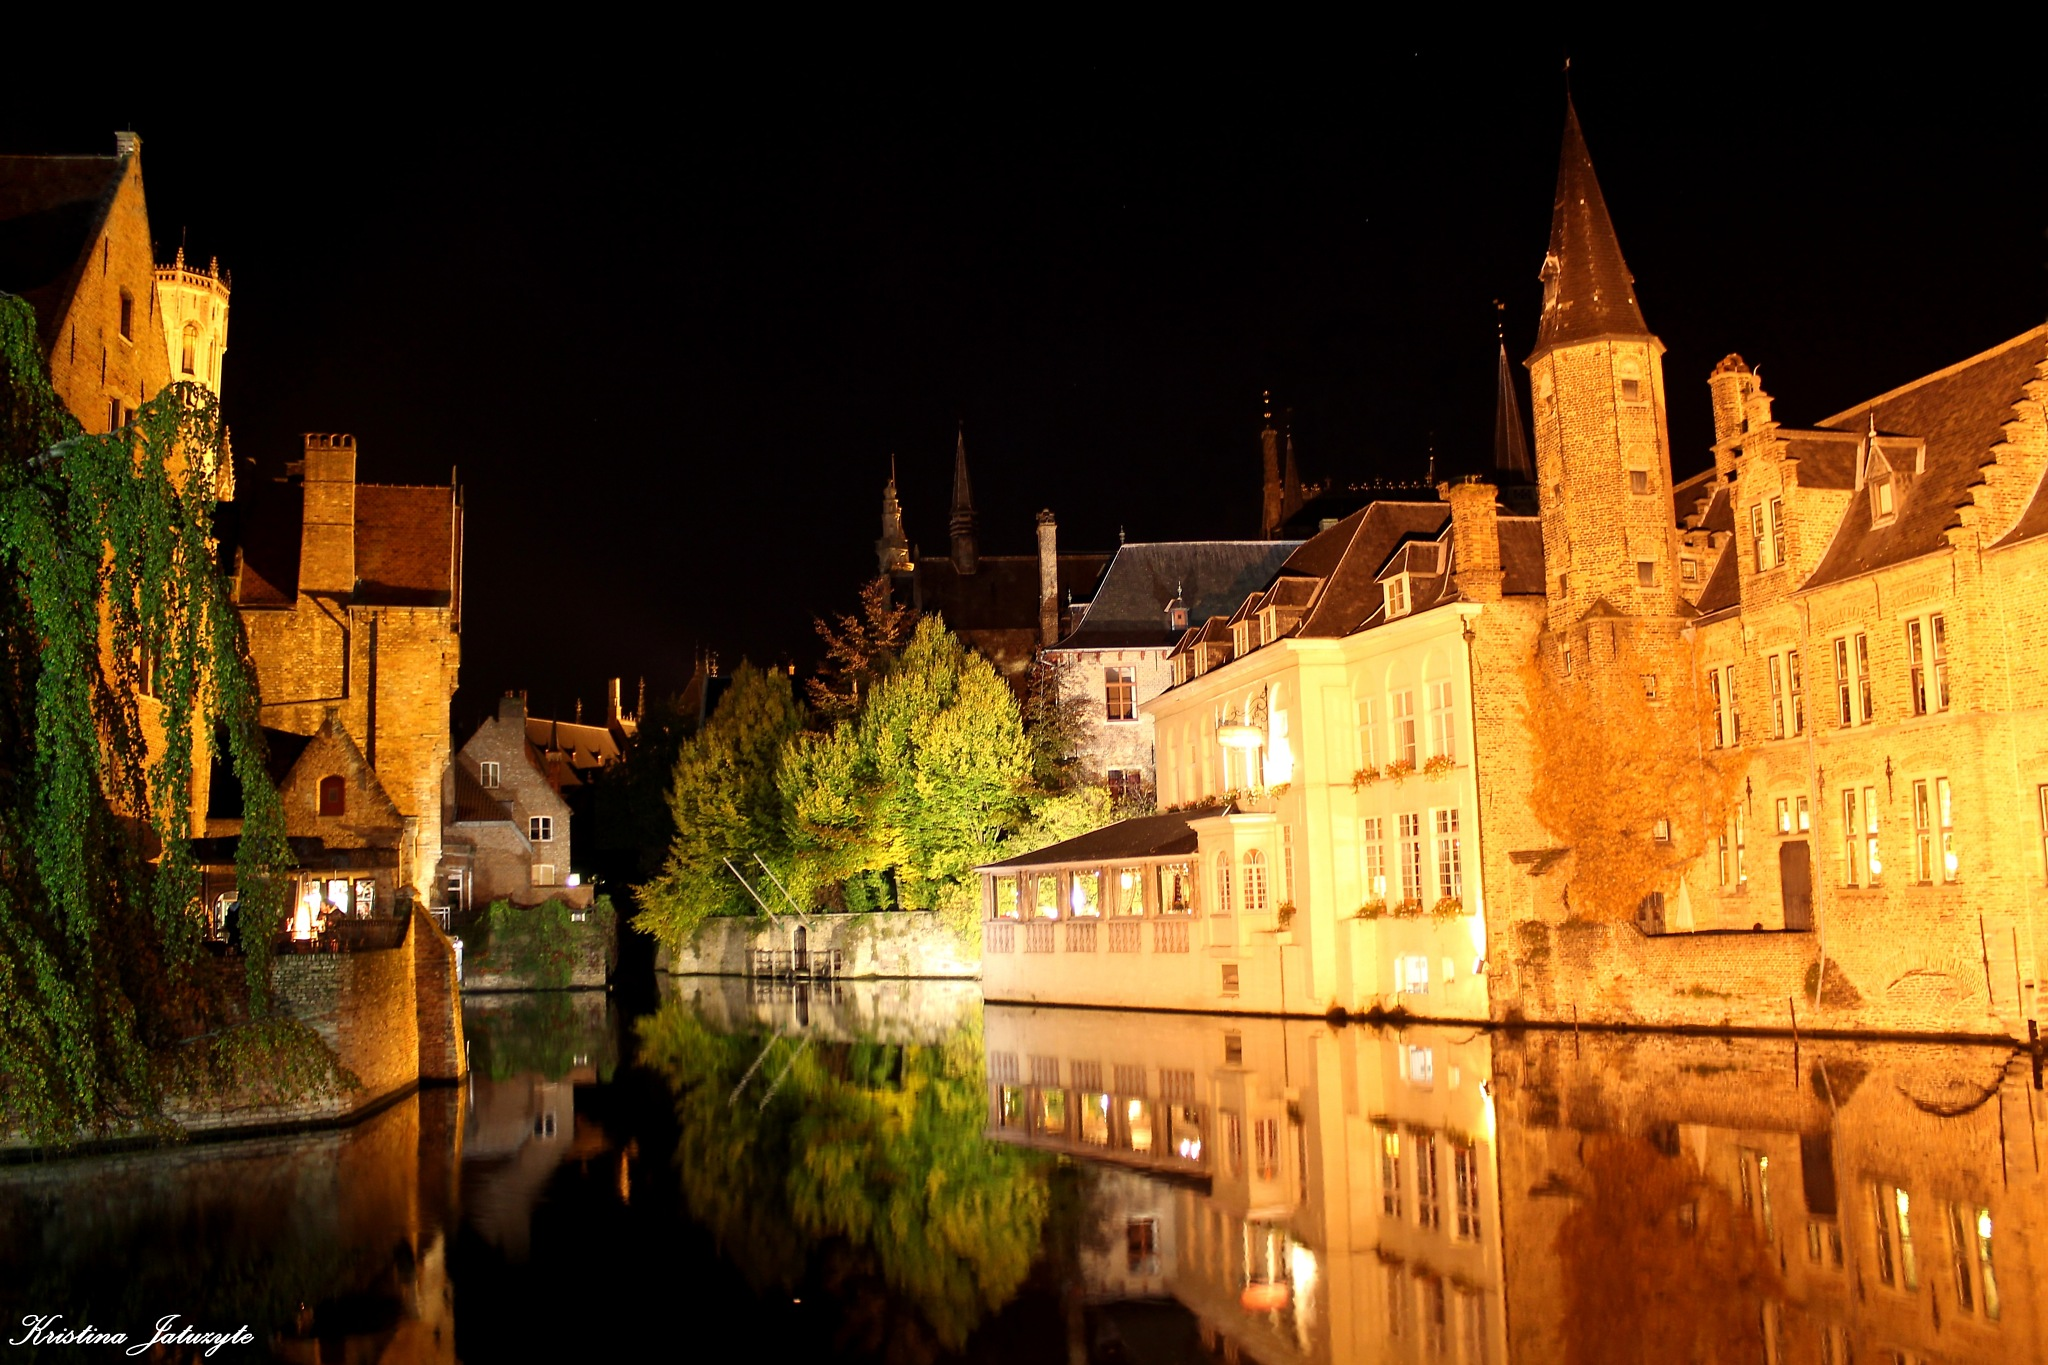 Bruges at night by Kristina Jatuzyte